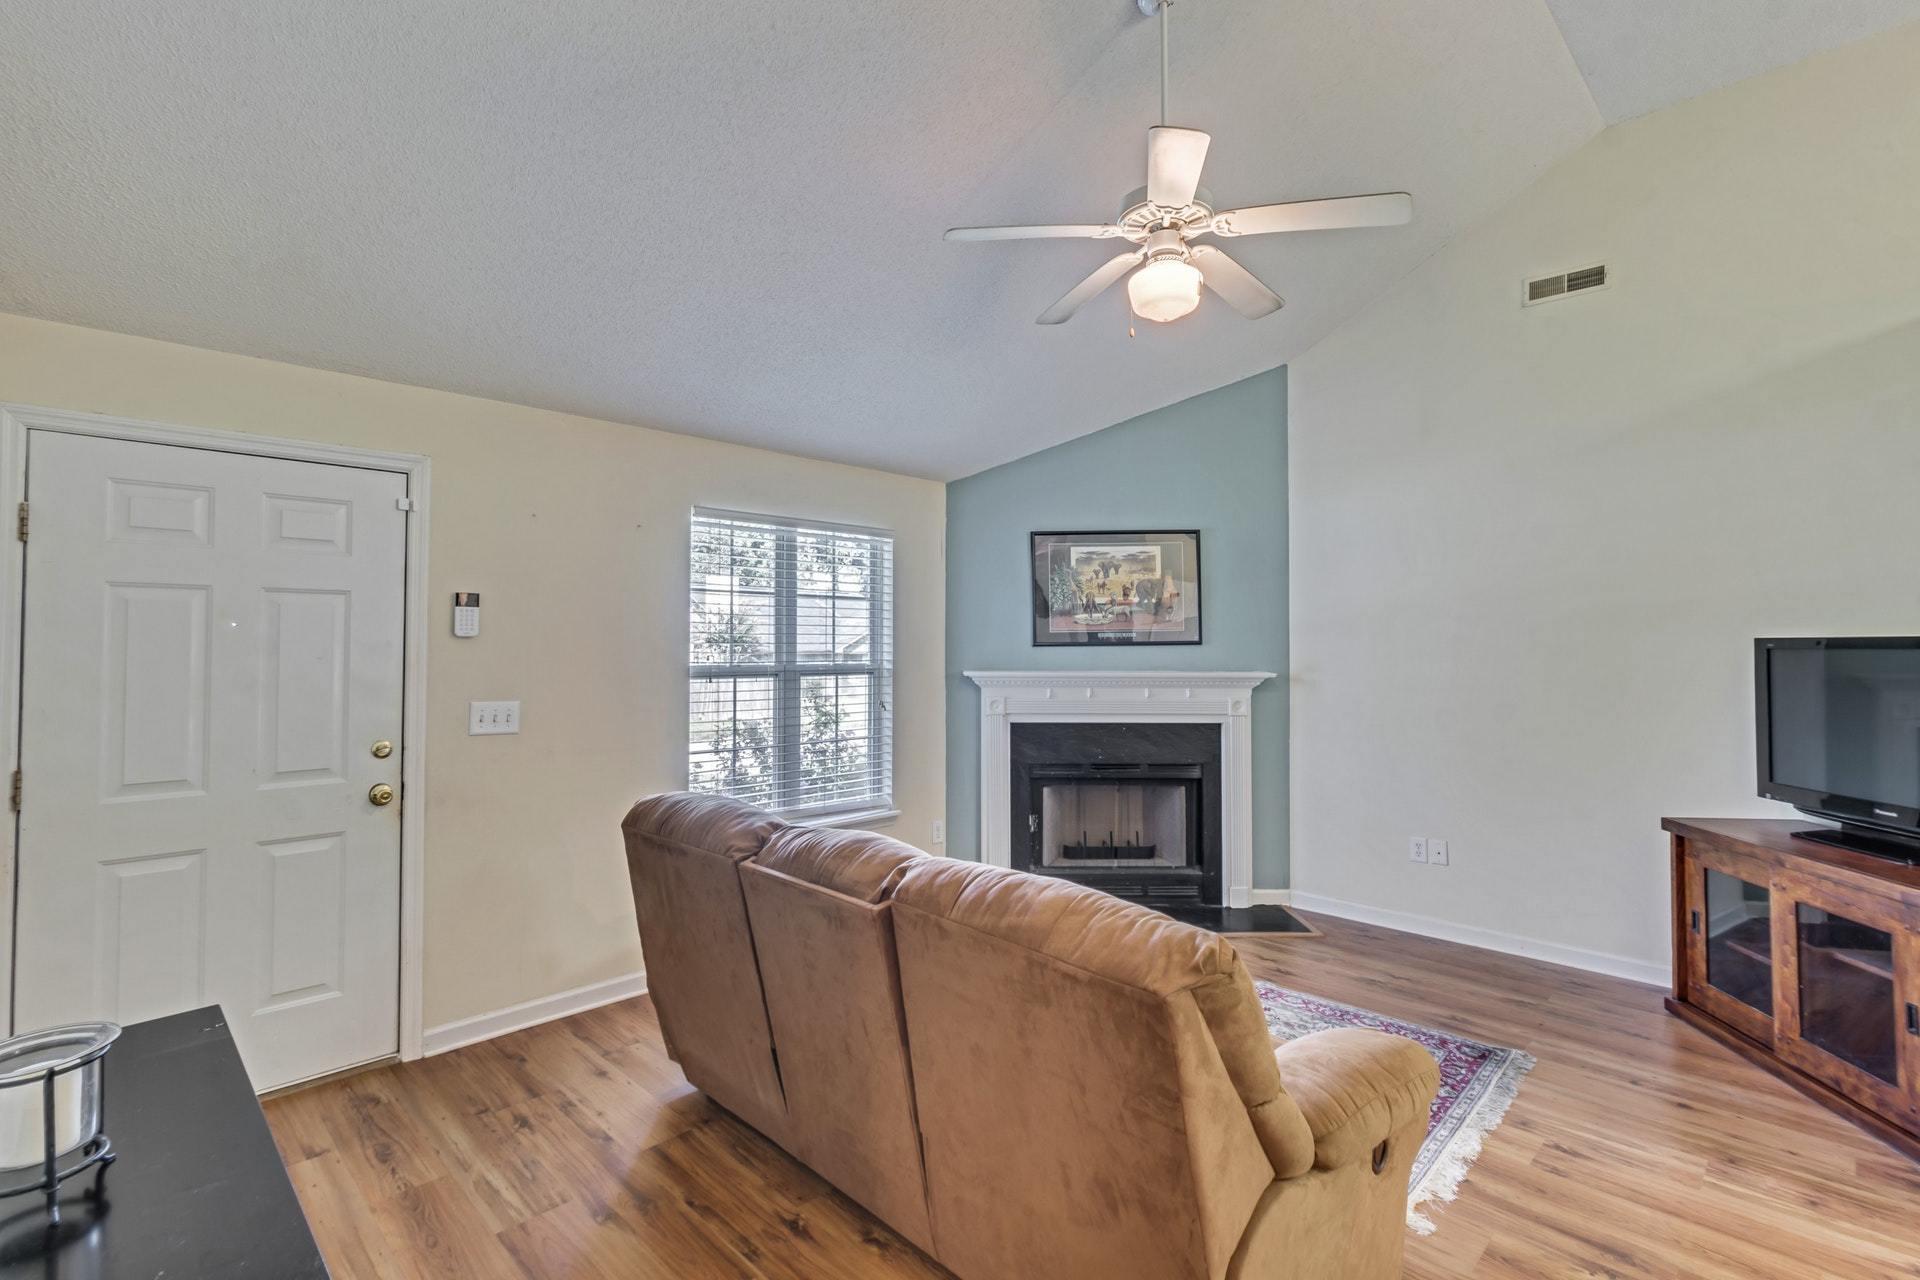 Double Oaks Homes For Sale - 2402 Double Oak, Charleston, SC - 4